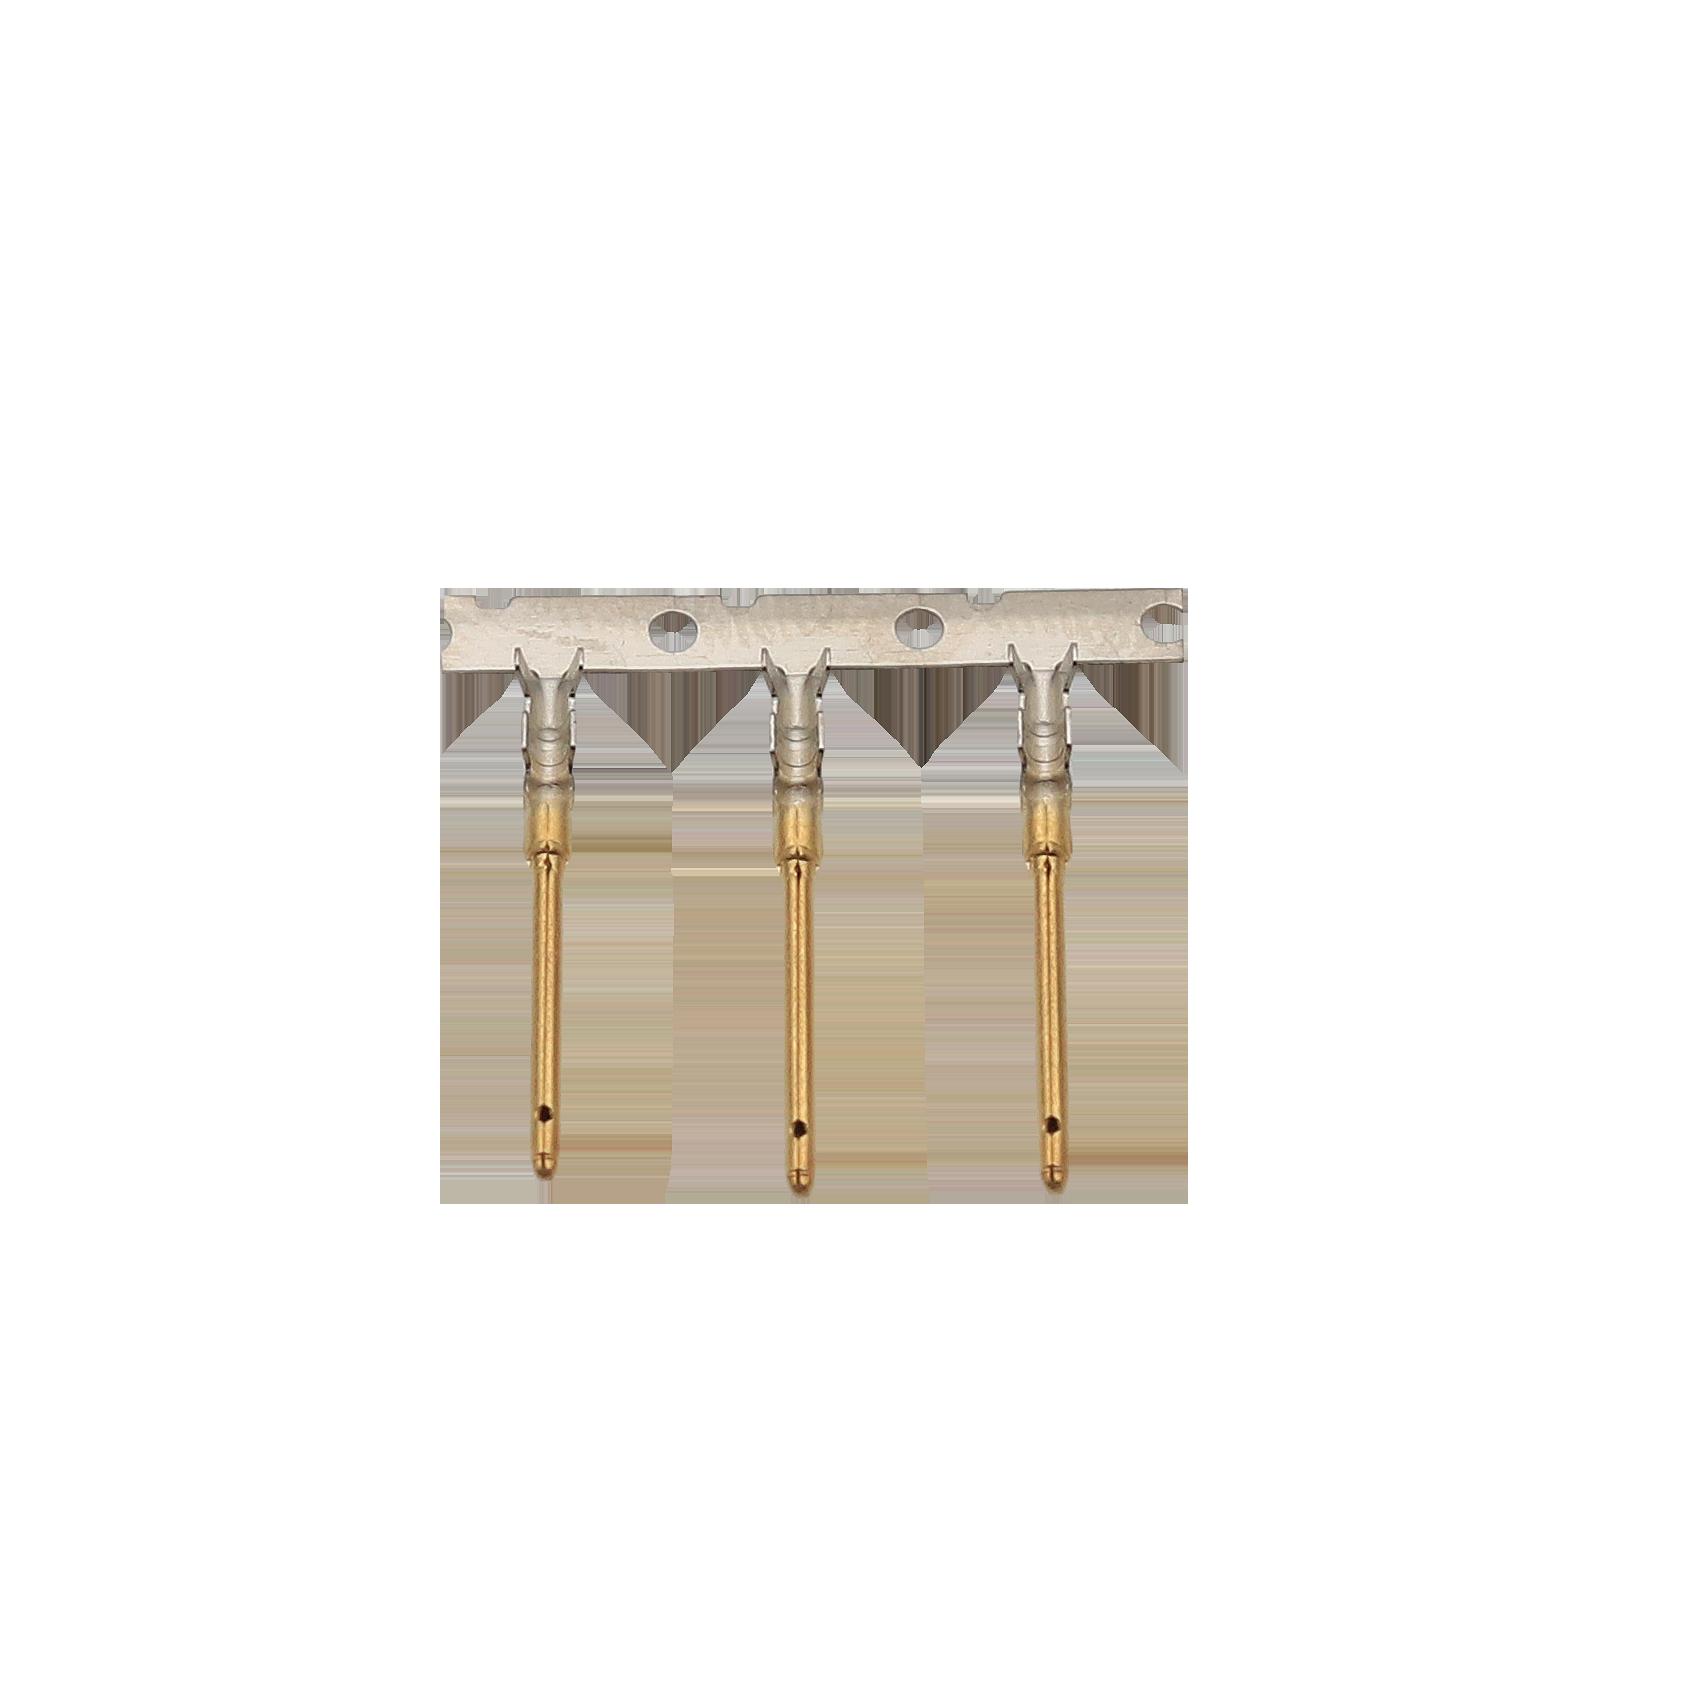 1.0X18.5鍍金公端 醫療端子接插件端子精密模具優質生產廠家志盈端子